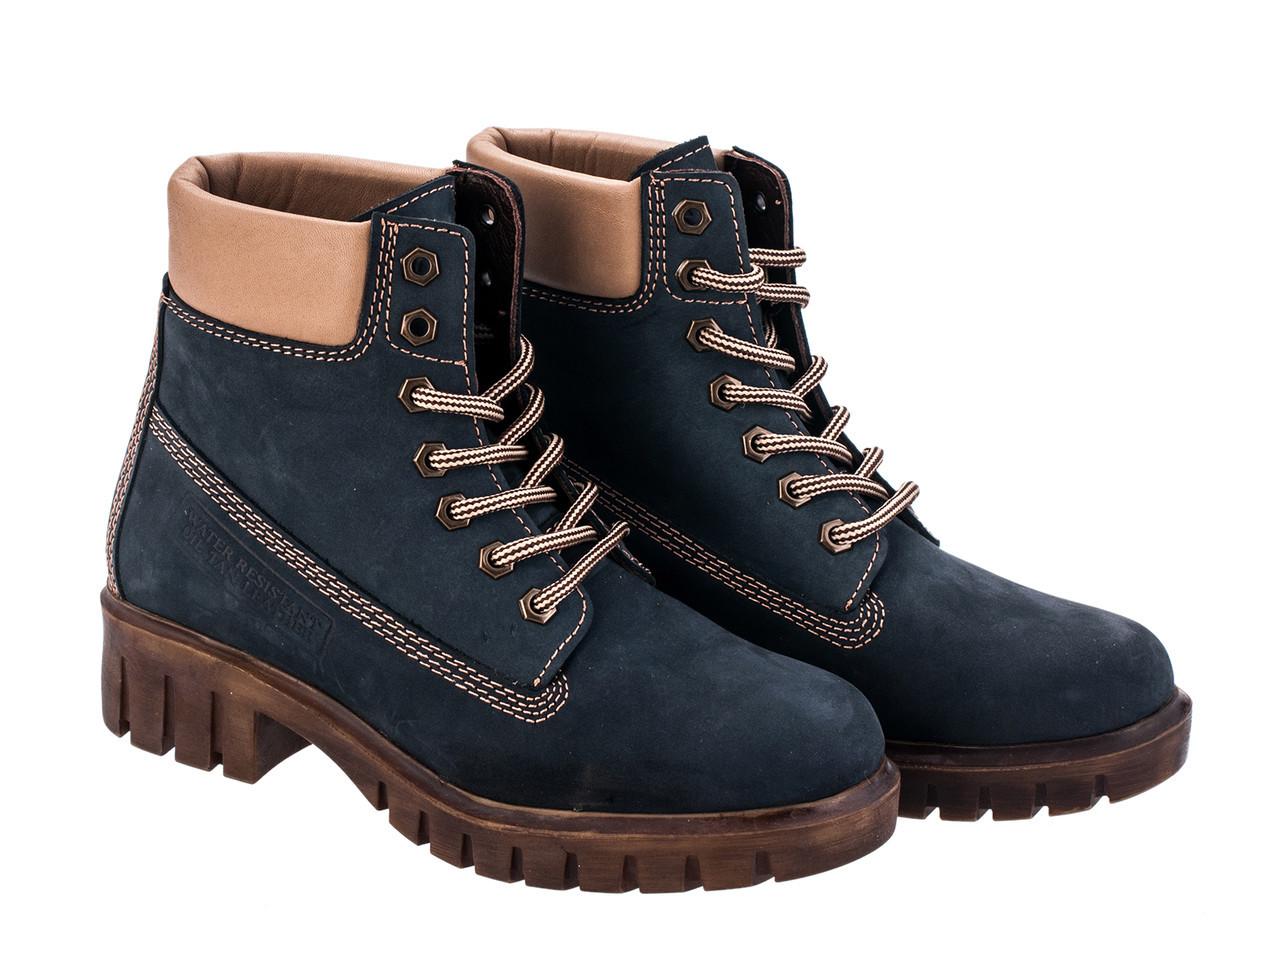 Ботинки Etor 5169-021554-823-1 40 синие